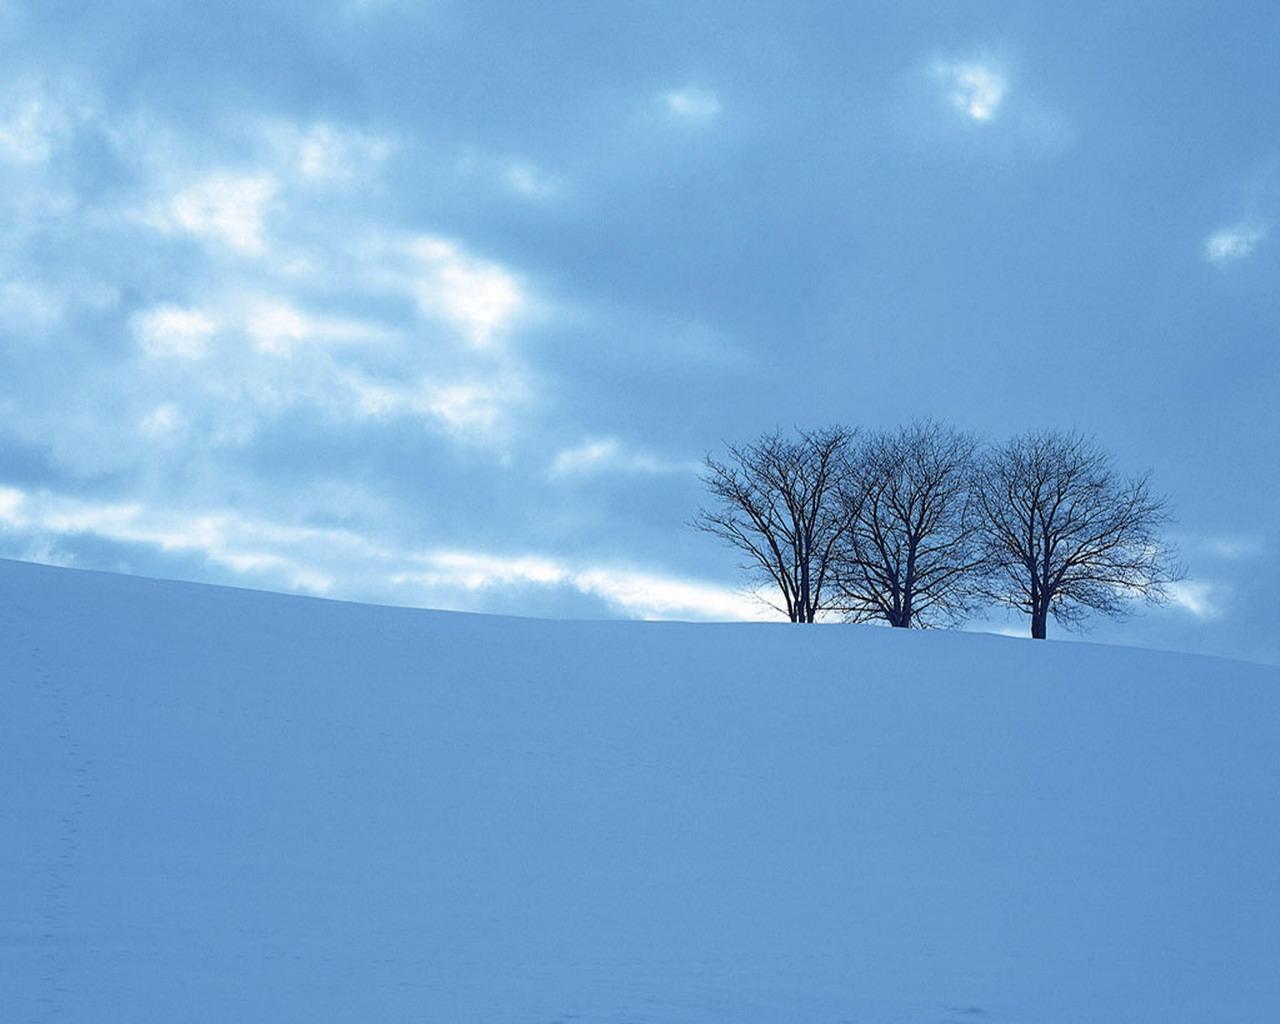 snow trees wallpaper 1280x1024